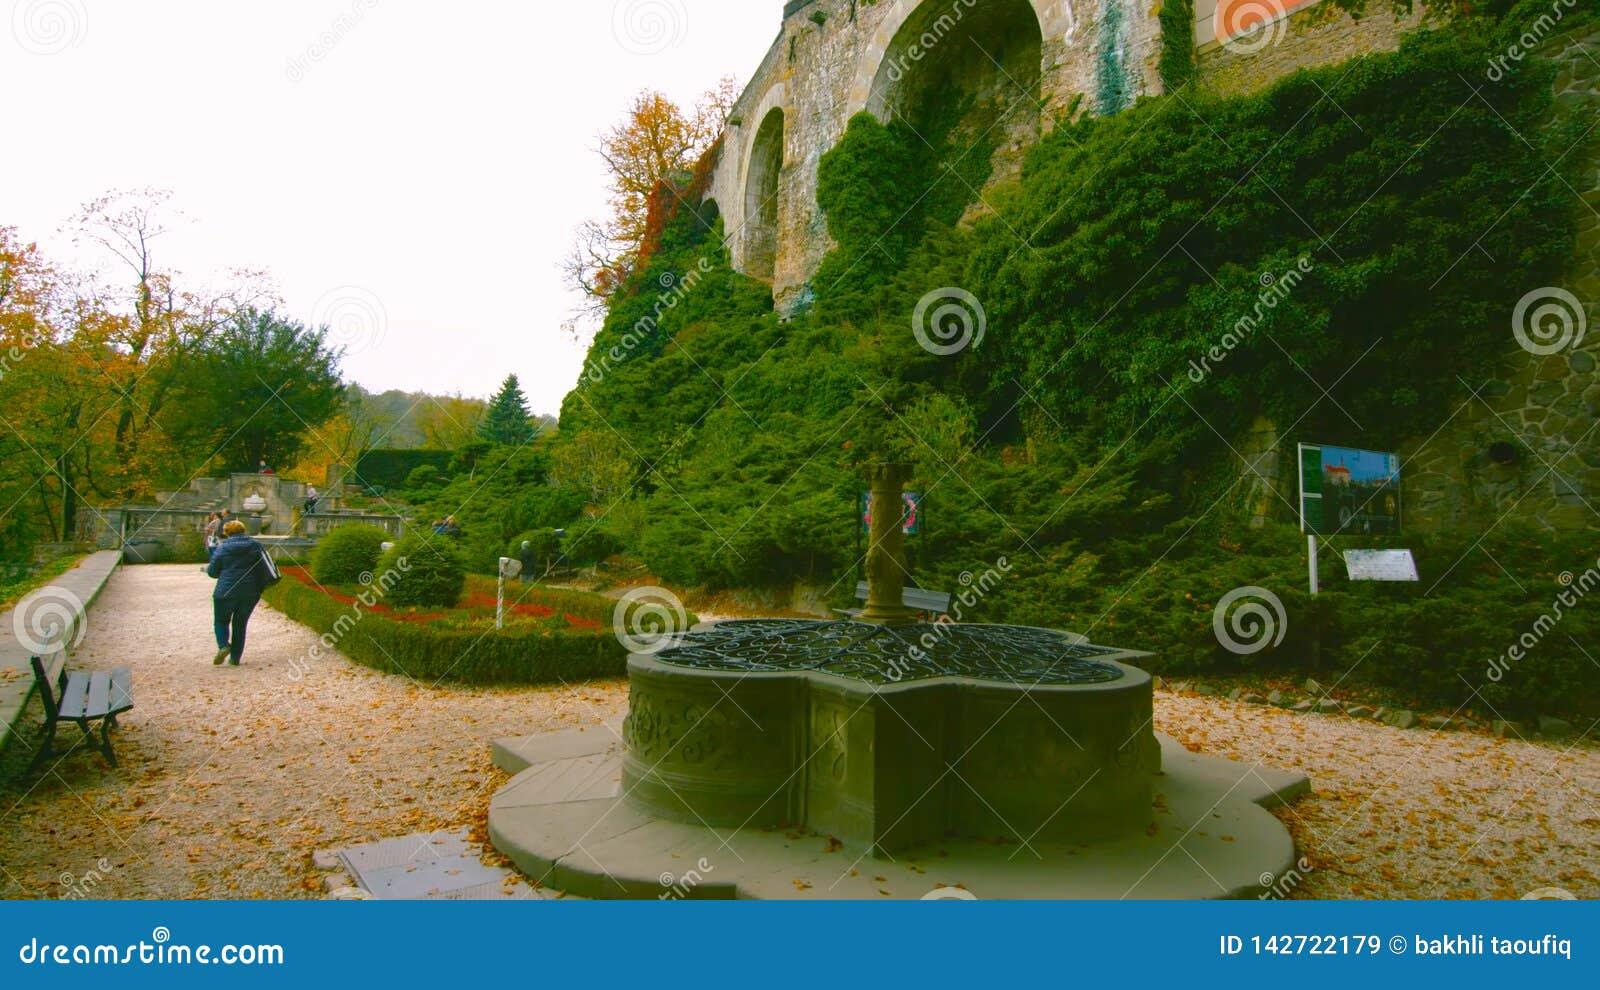 Colorful garden with fountain in spring near -poland 2019-  - Bilder